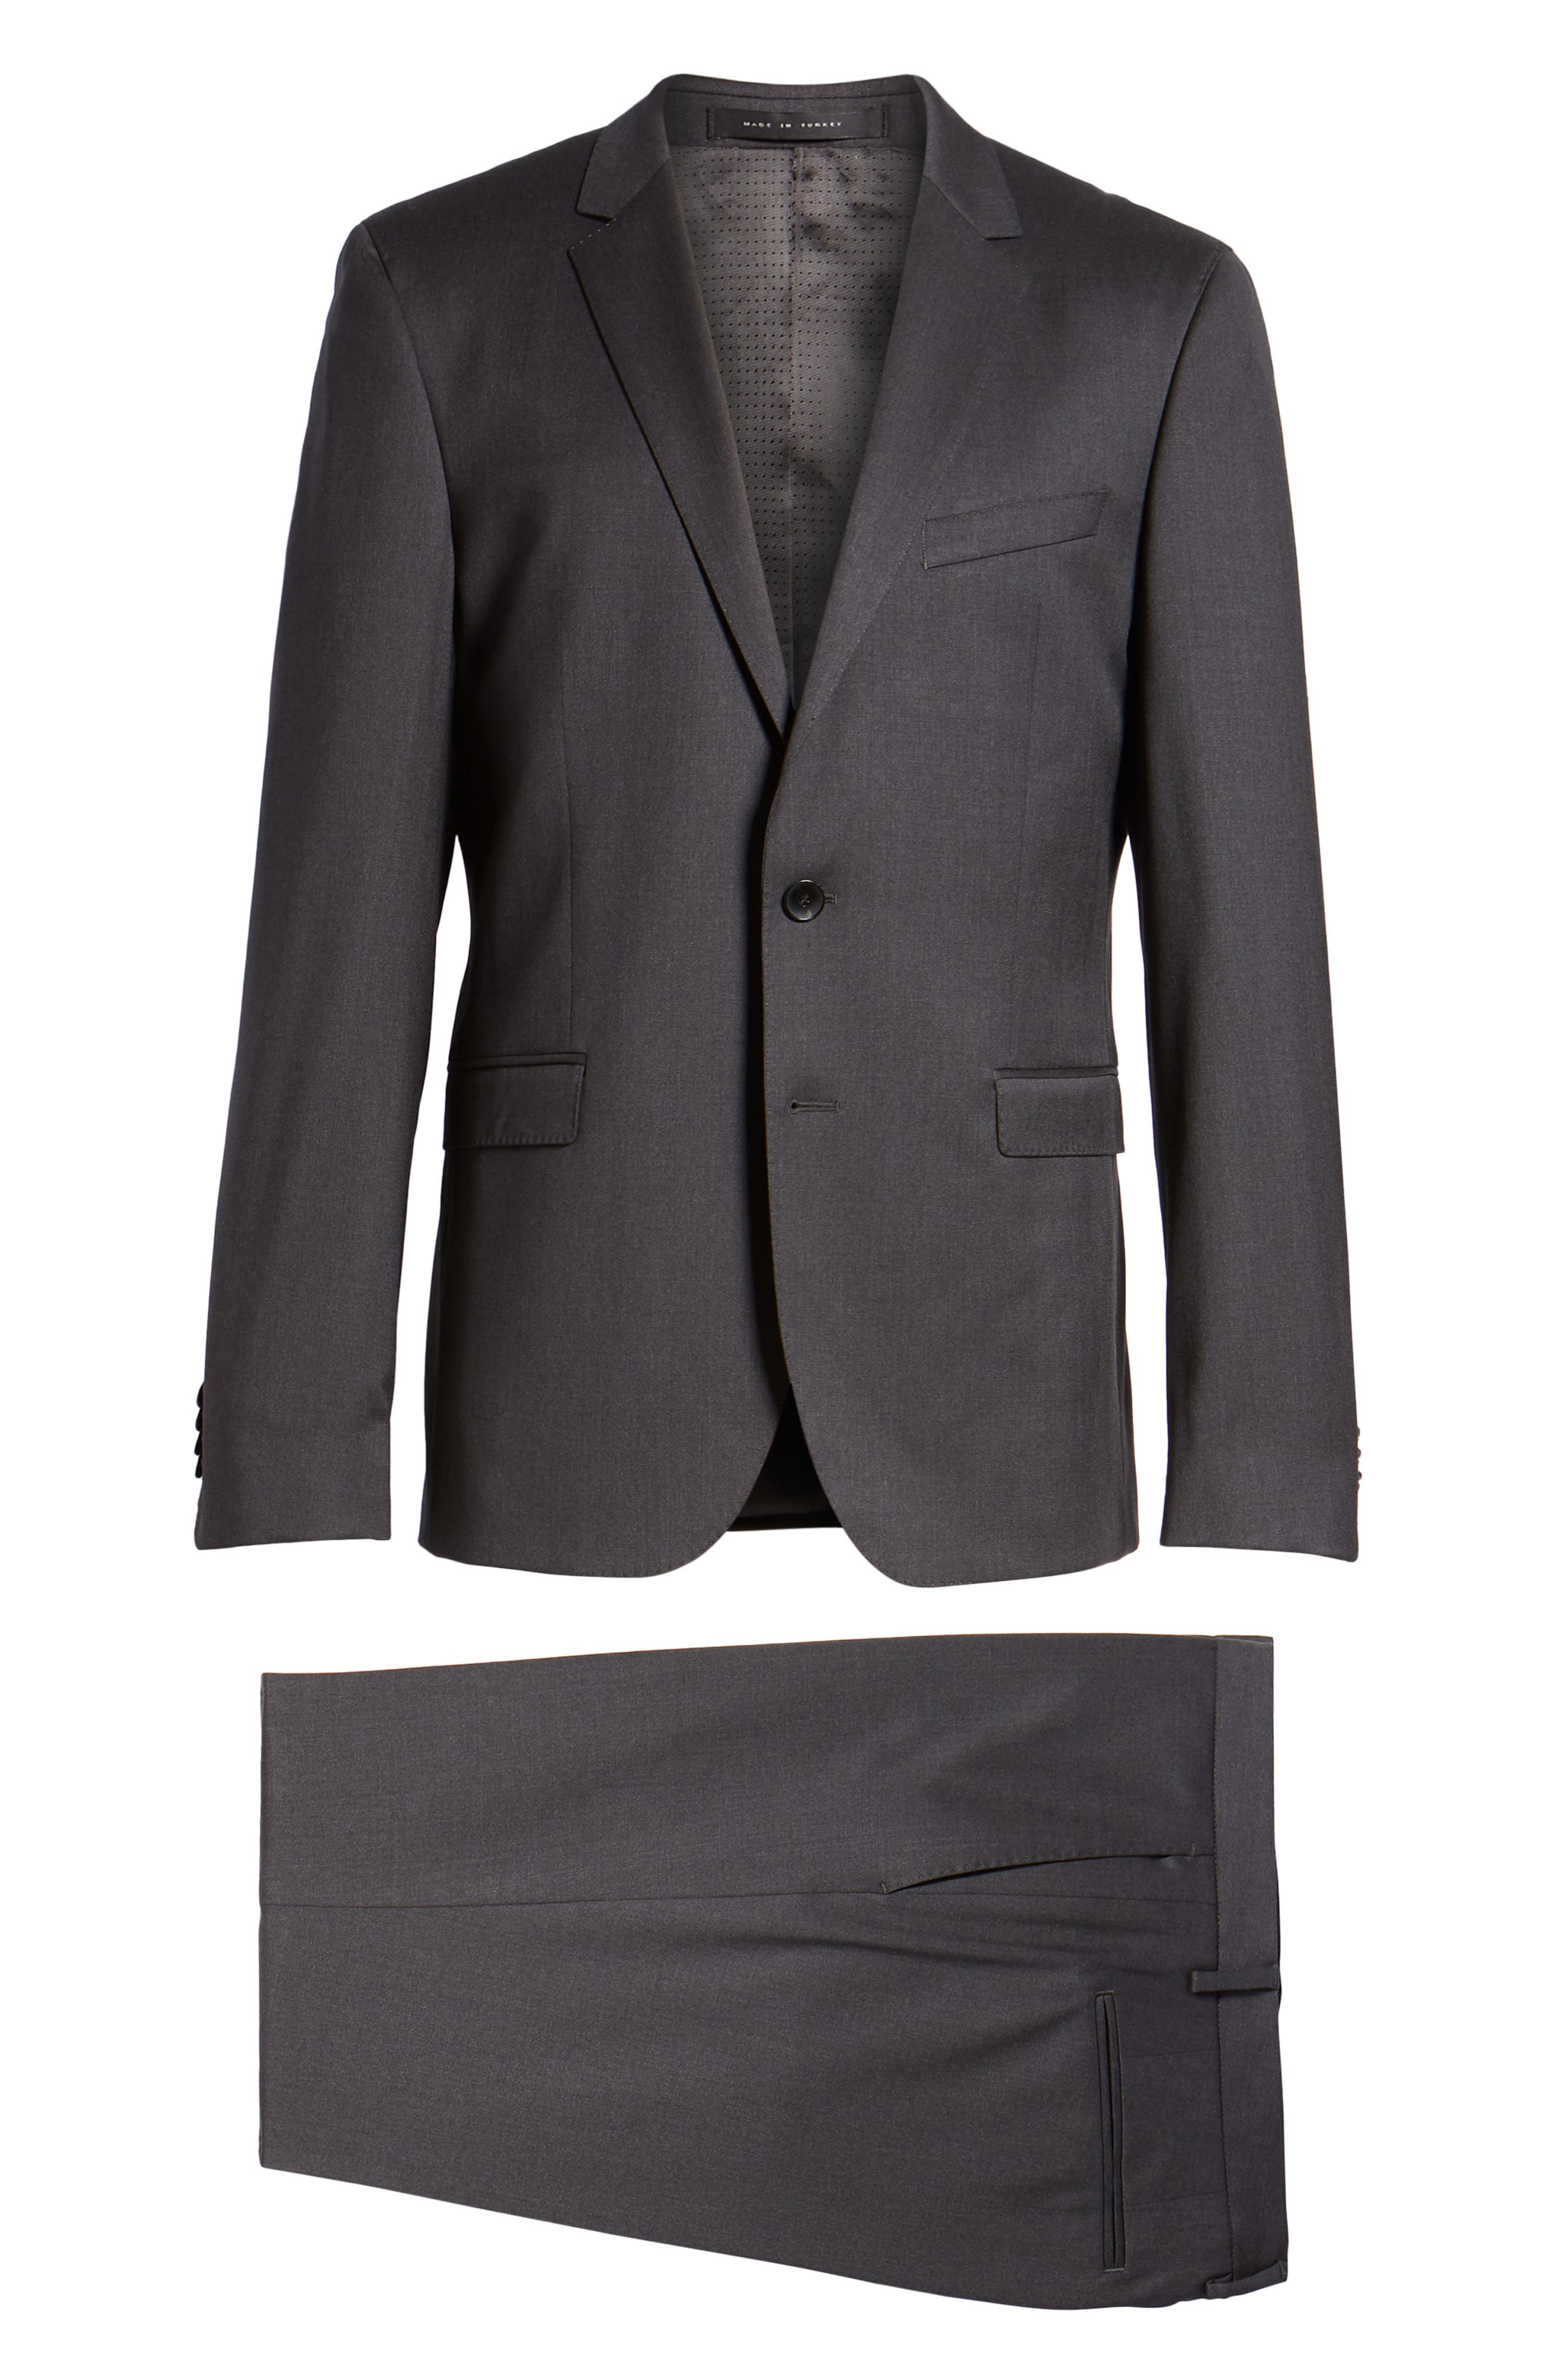 'Ryan/Win' Extra Trim Fit Solid Wool Suit,                             Alternate thumbnail 9, color,                             Dark Grey